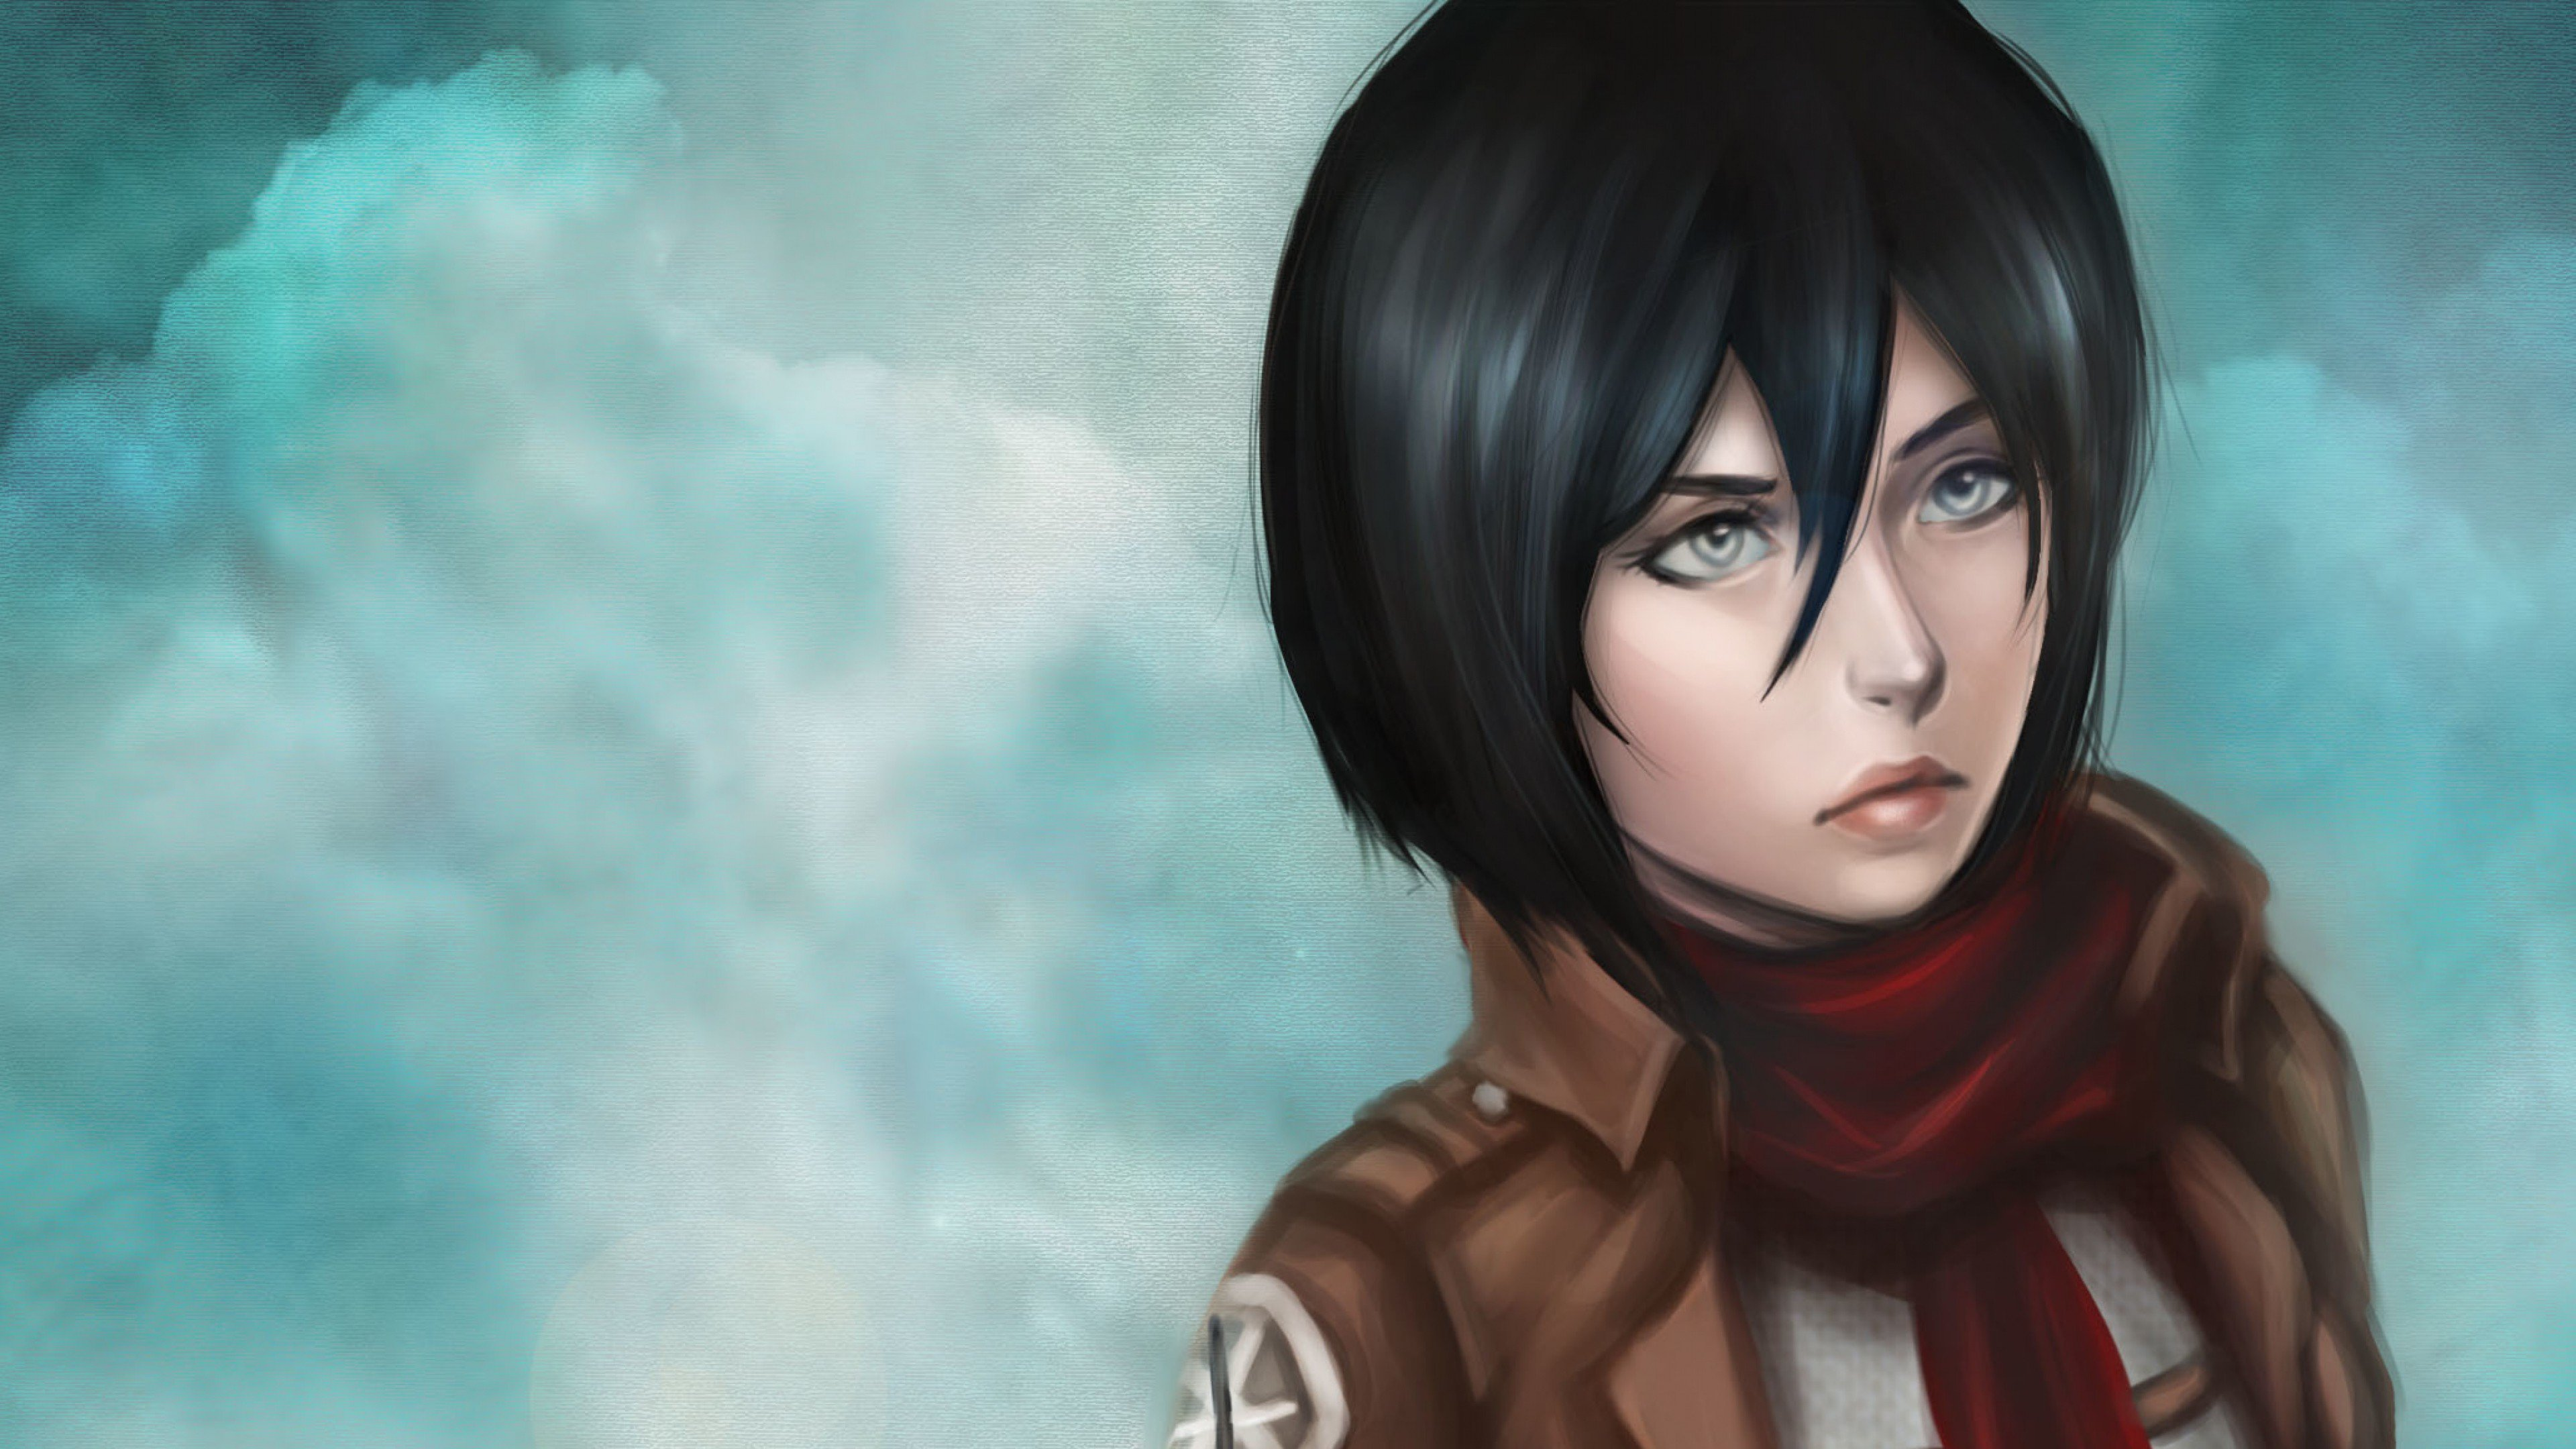 642 <b>Mikasa Ackerman</b> HD <b>Wallpapers</b> | <b>Backgrounds</b> - <b>Wallpaper</b> Abyss